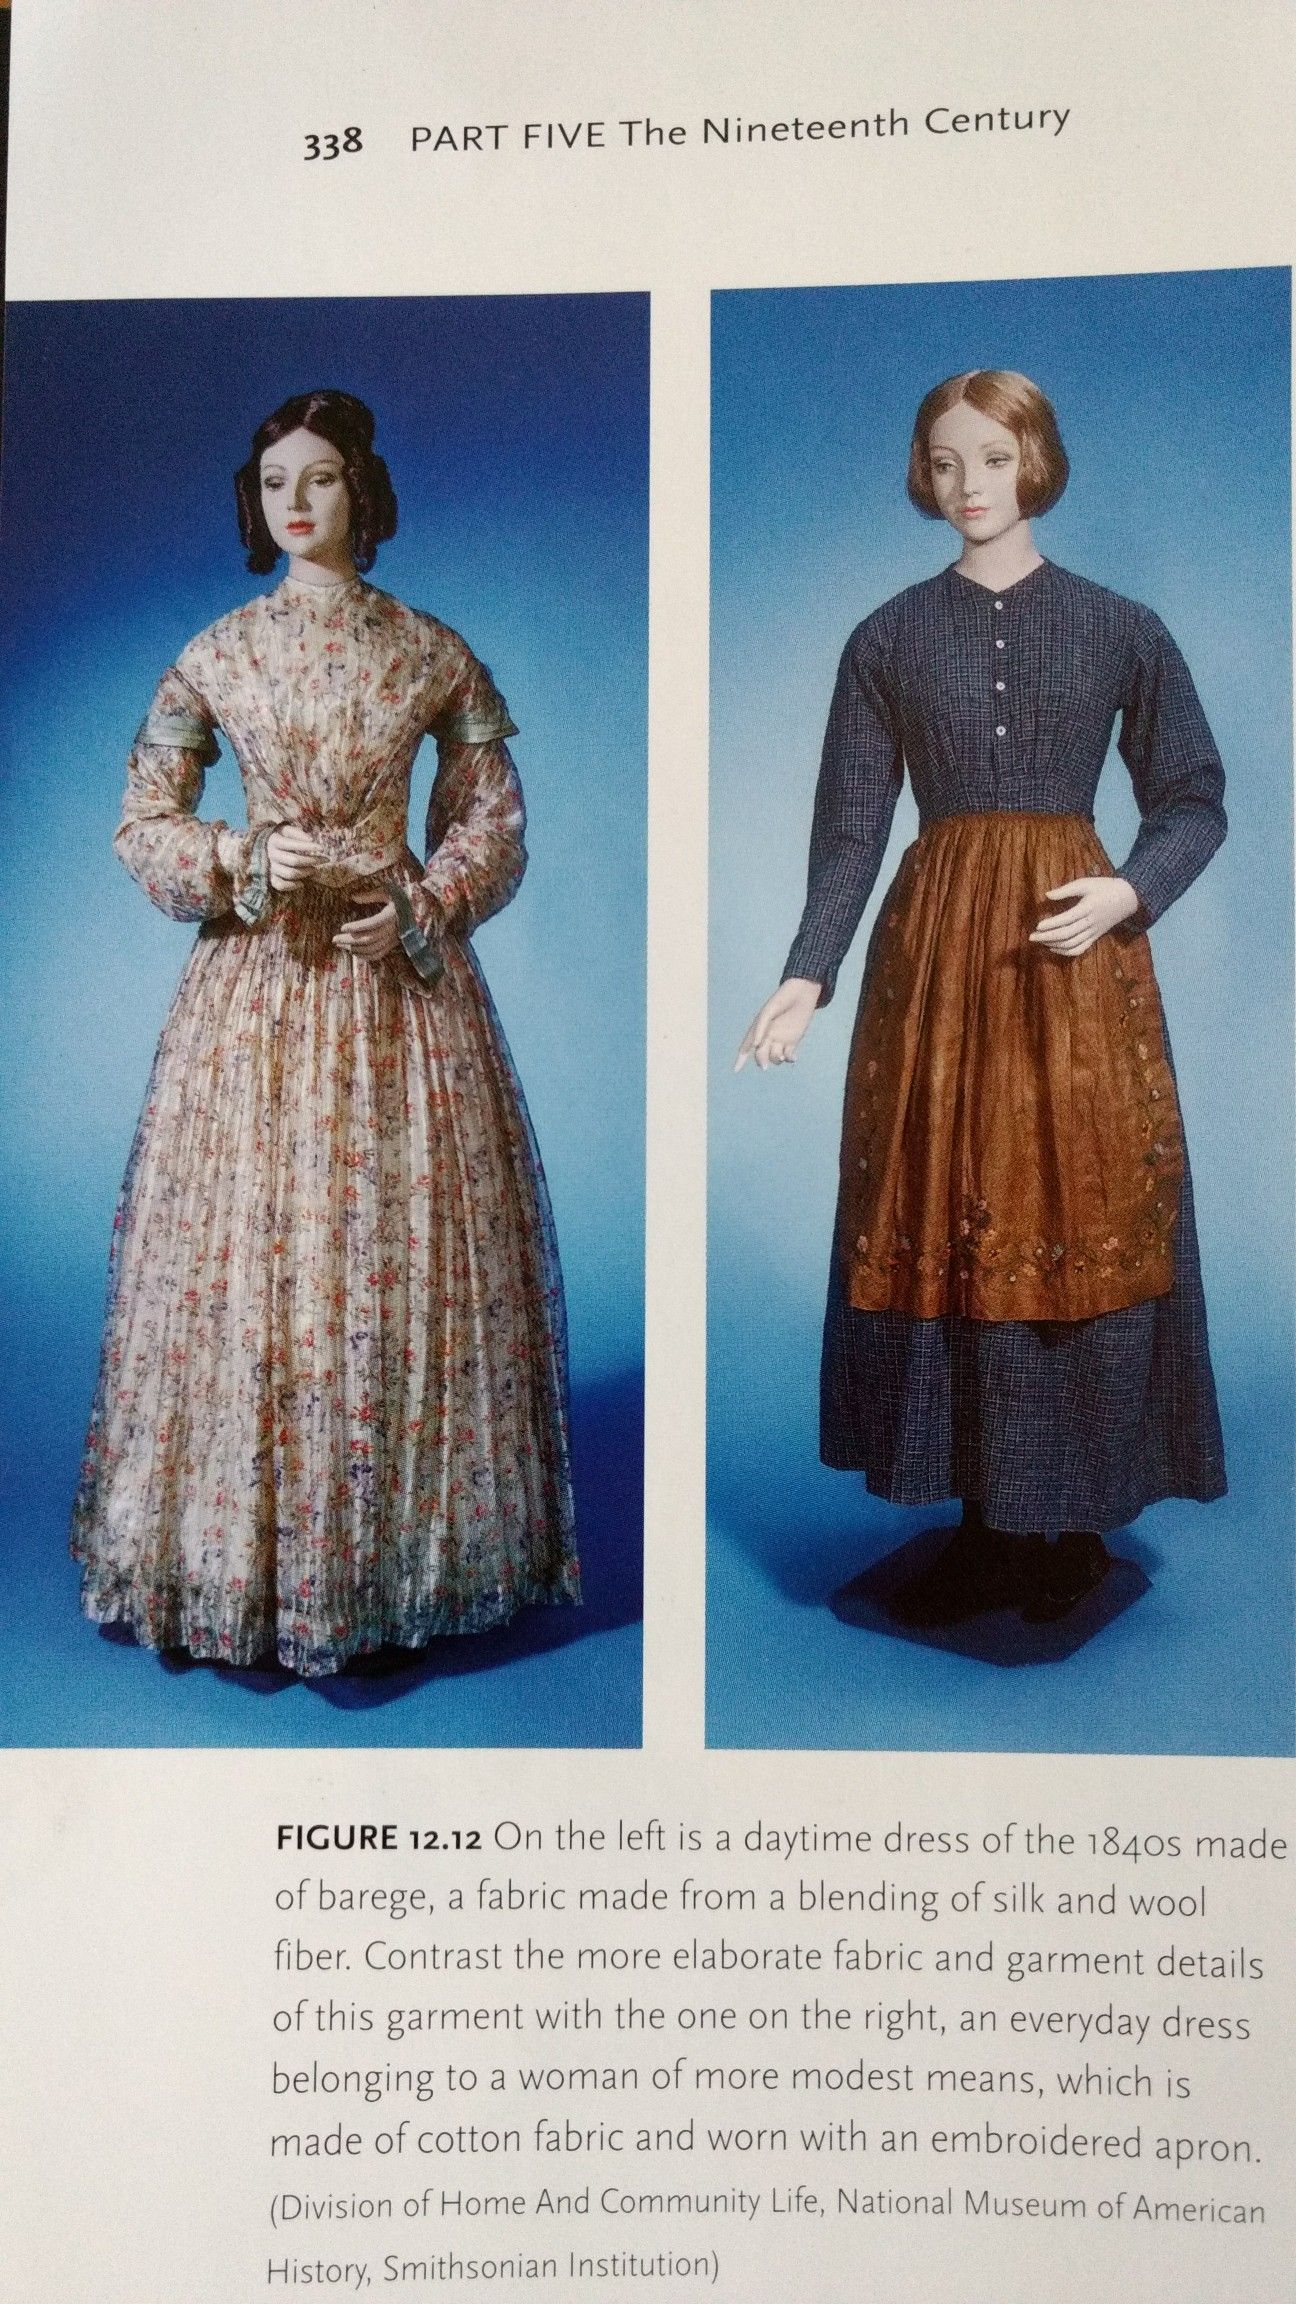 1840s Day Dress Vs 1840s Servant Dress Historical Costume 1840s Day Dress Historical Dresses [ 2304 x 1296 Pixel ]